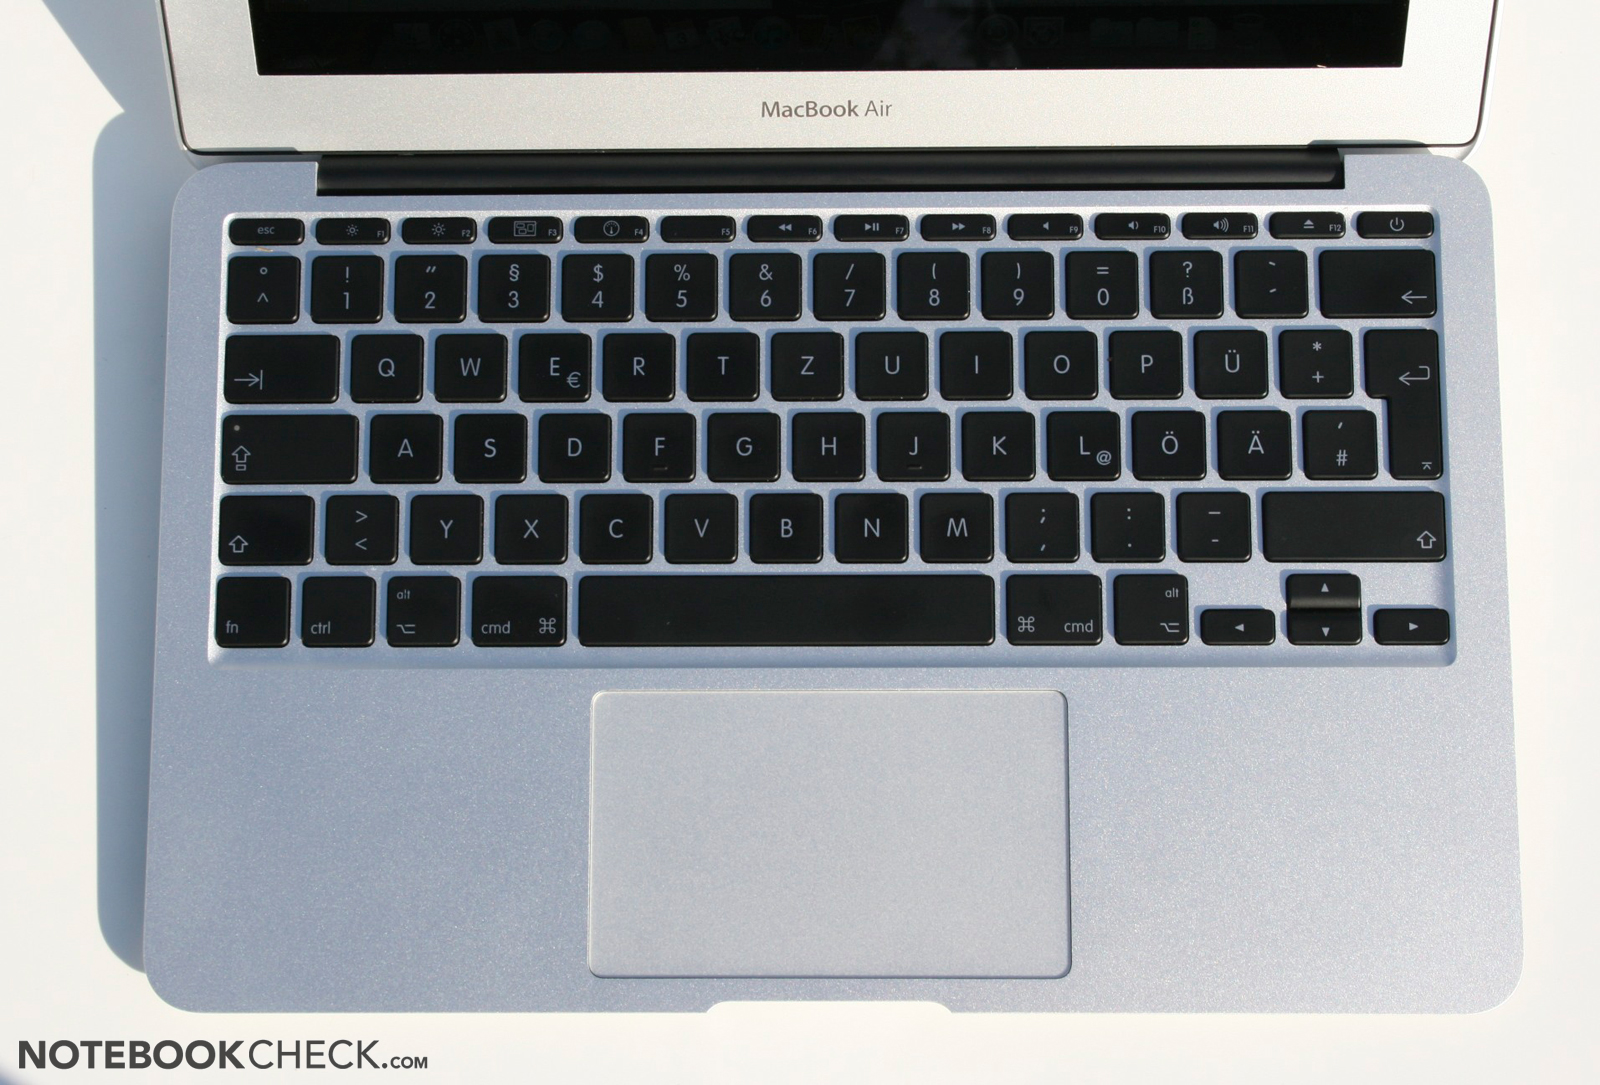 кран мак эйр залила клавиатуру для любых